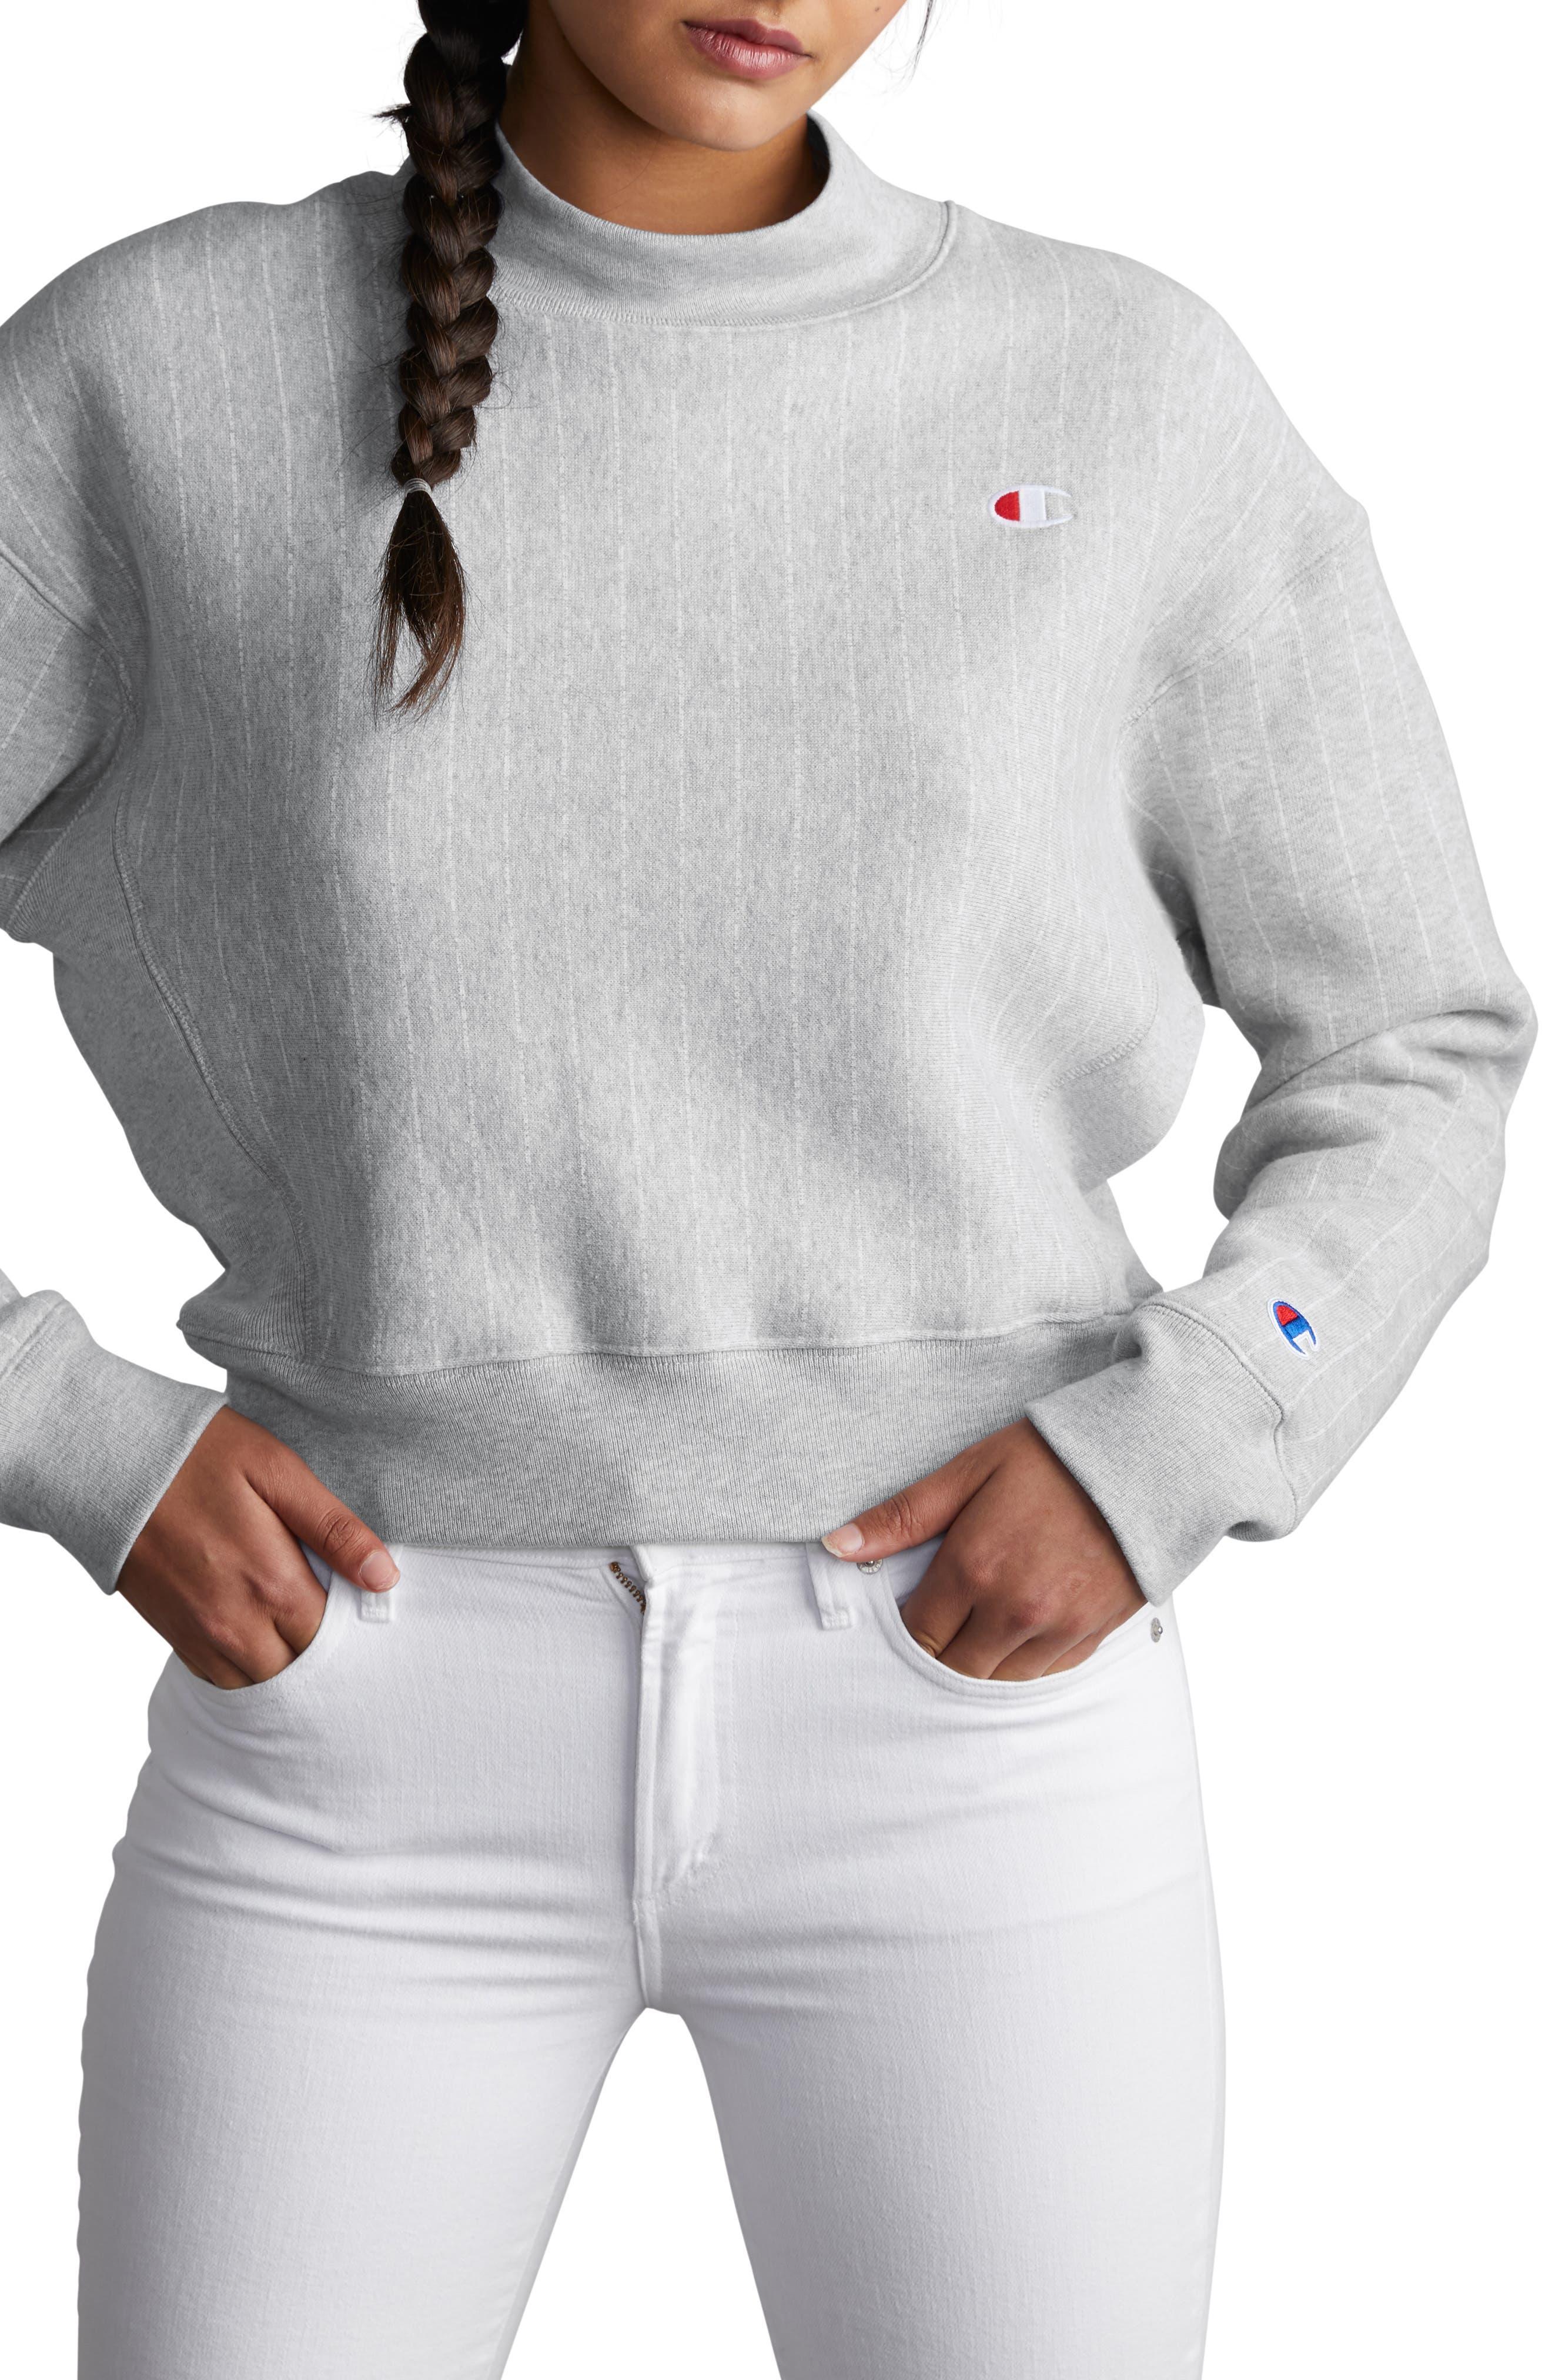 CHAMPION Mock Neck Reverse Panel Crop Sweatshirt, Main, color, PINSTRIPE OXFORD GREY